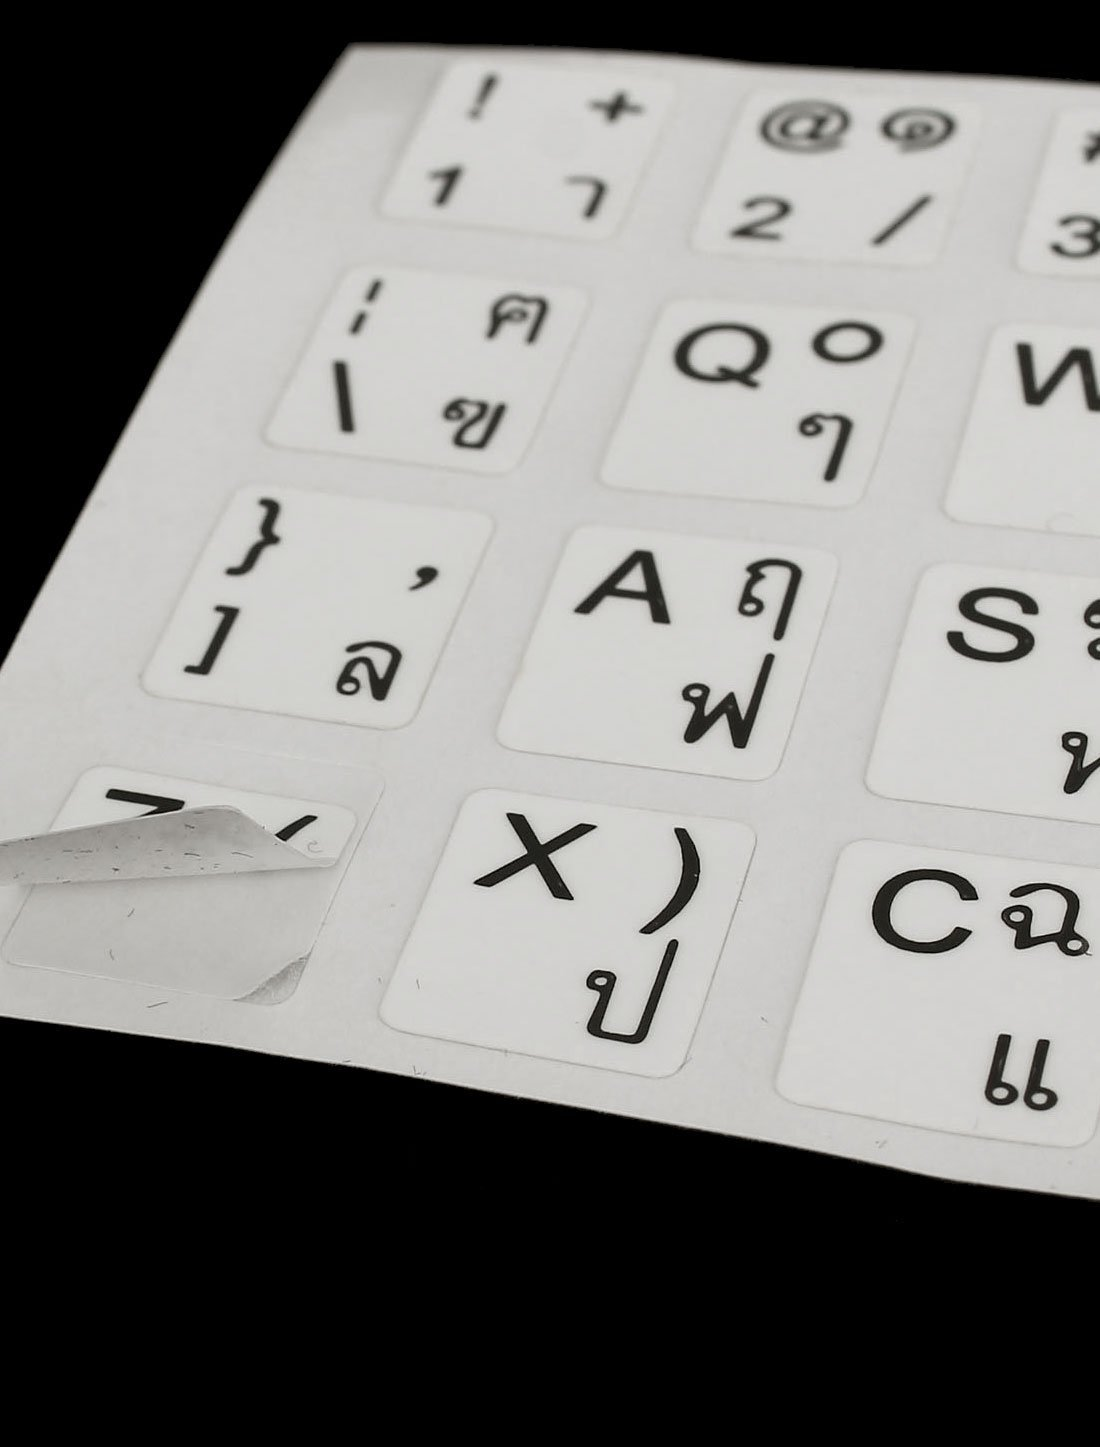 Amazon.com: Preto Letters Azerty árabe Teclado Adesivo Decalque Branco para PC portátil: Electronics